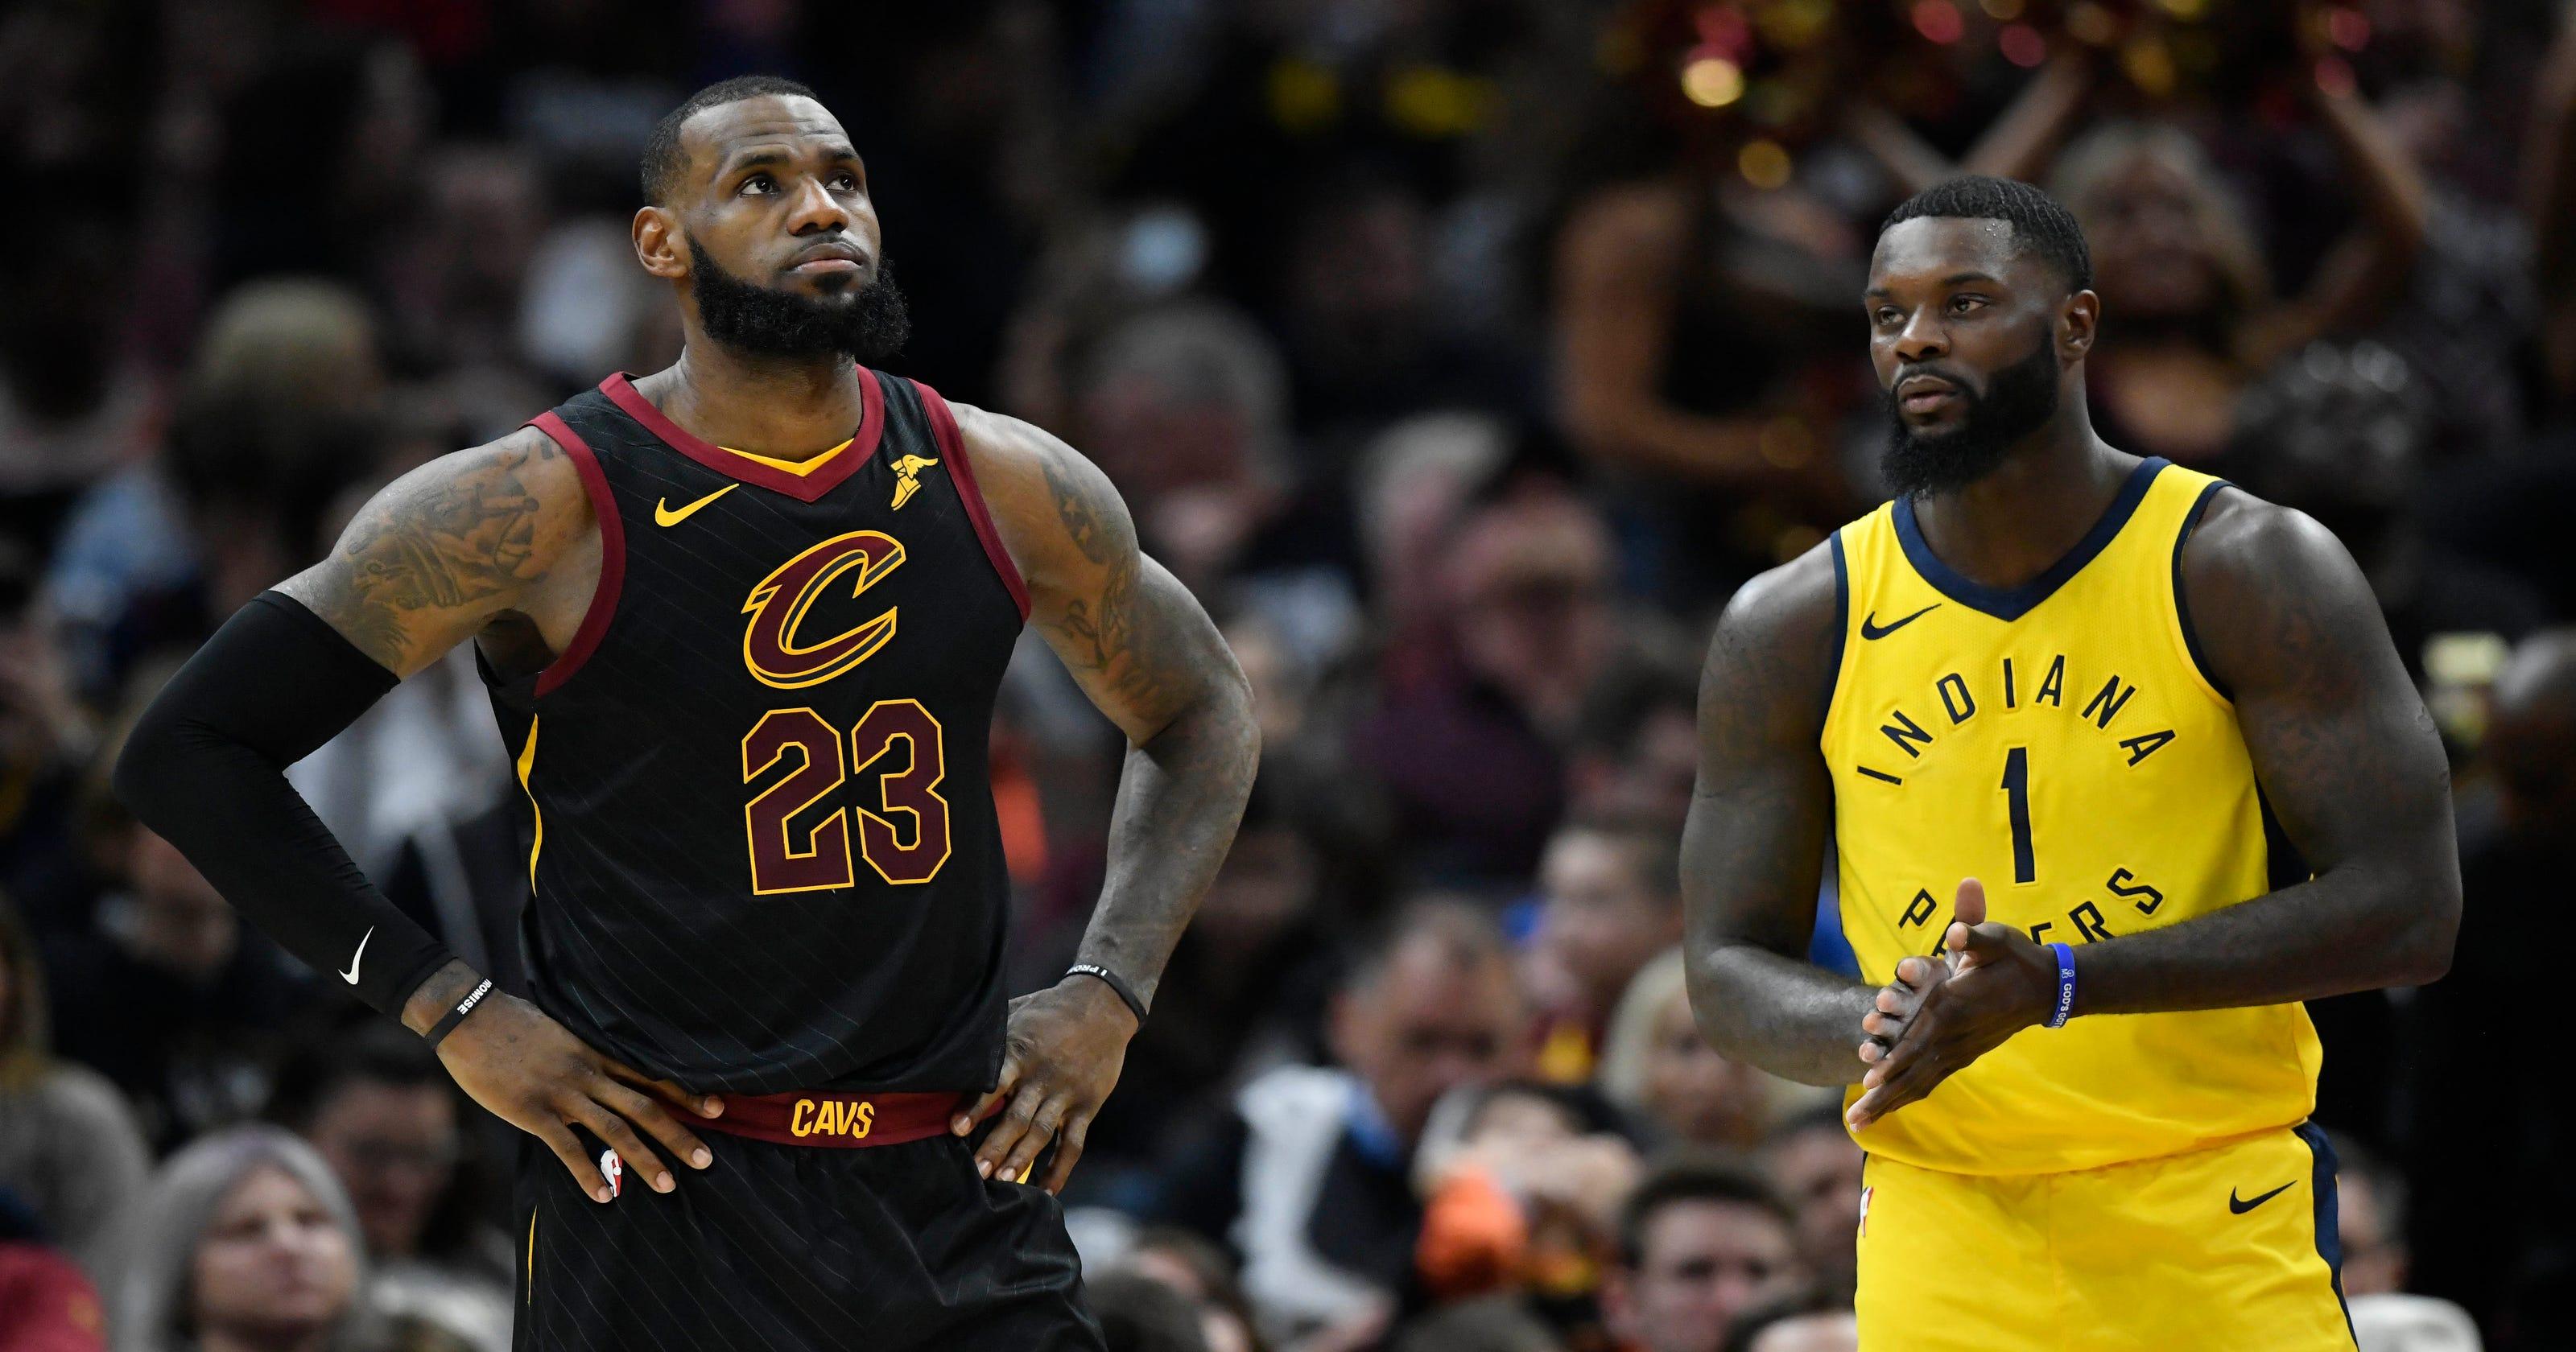 e1649df6727 NBA playoffs 2018  How Lance Stephenson made an impact